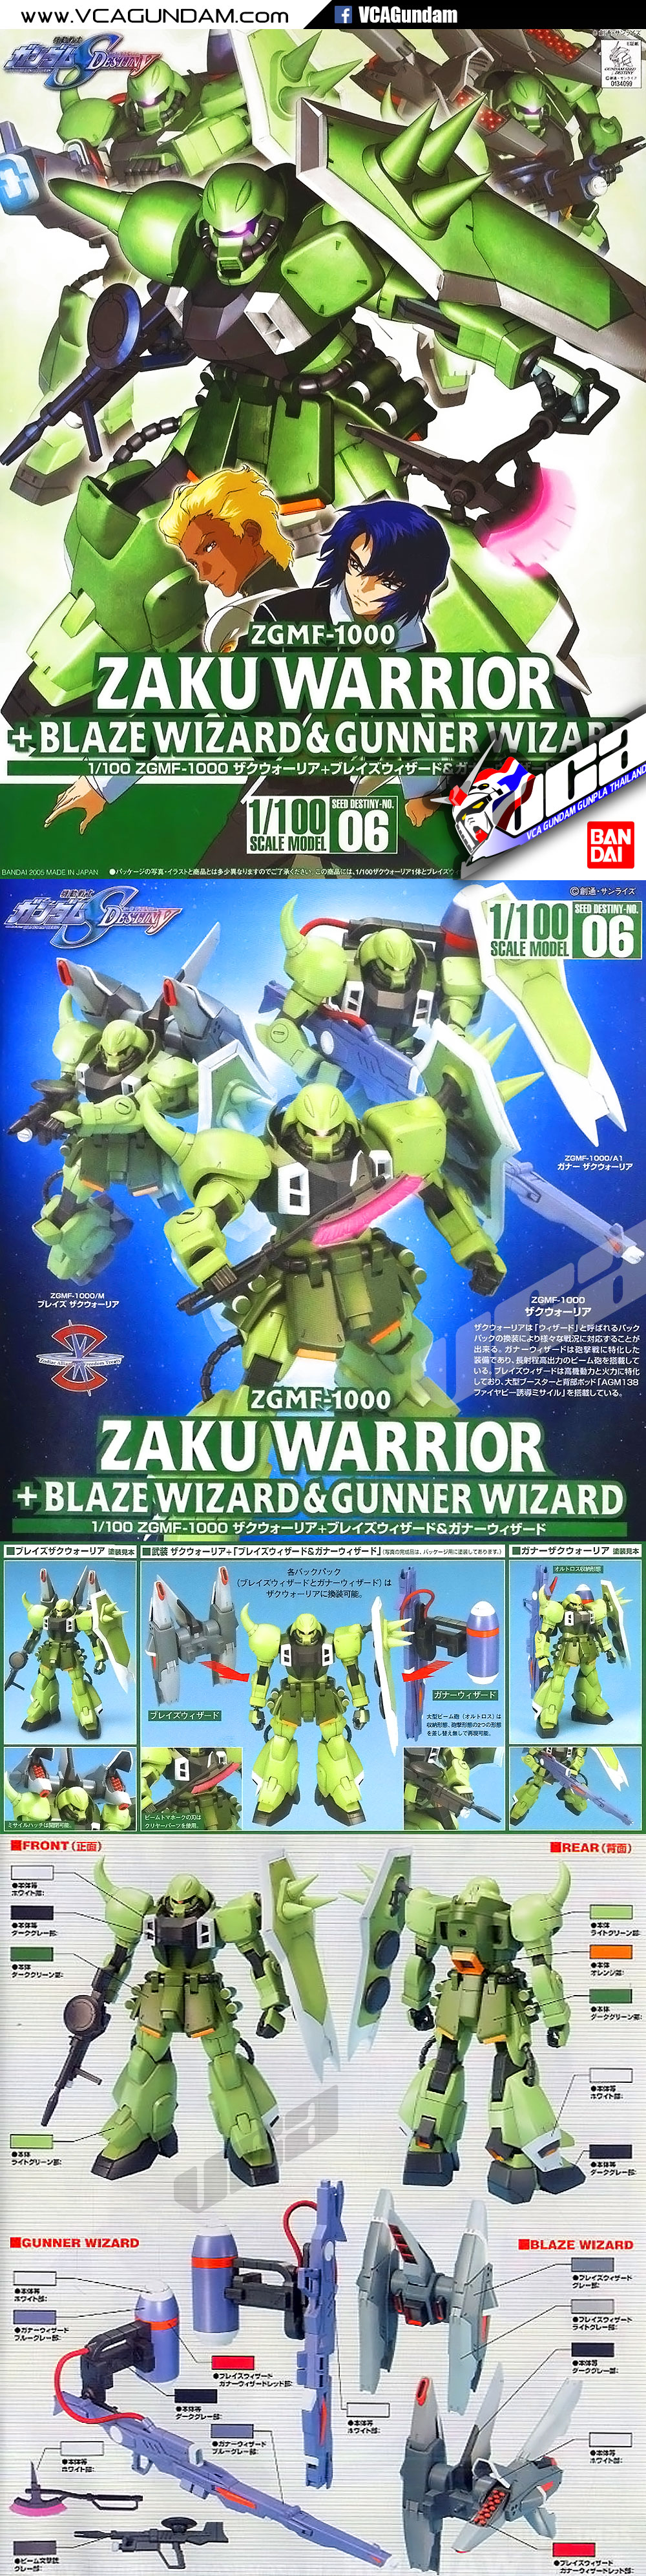 1/100 ZGMF-1000 ZAKU WARRIOR ซาคุ วอริเออร์